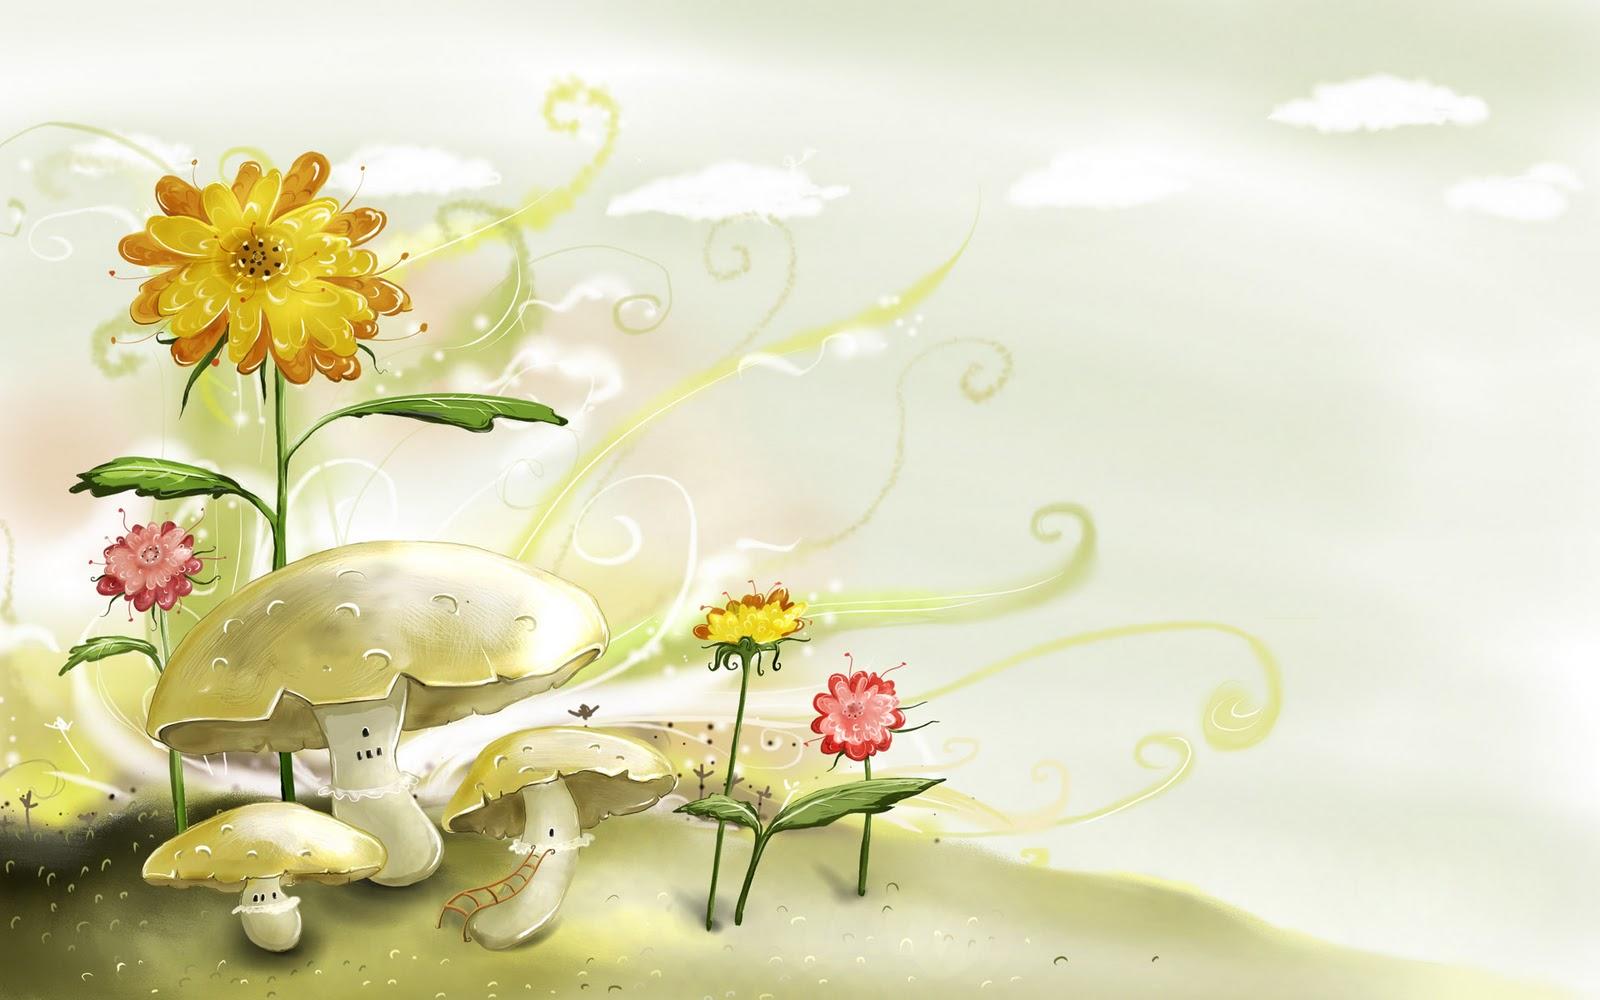 cute spring wallpaper cute spring wallpaper cute spring wallpaper cute 1600x1000